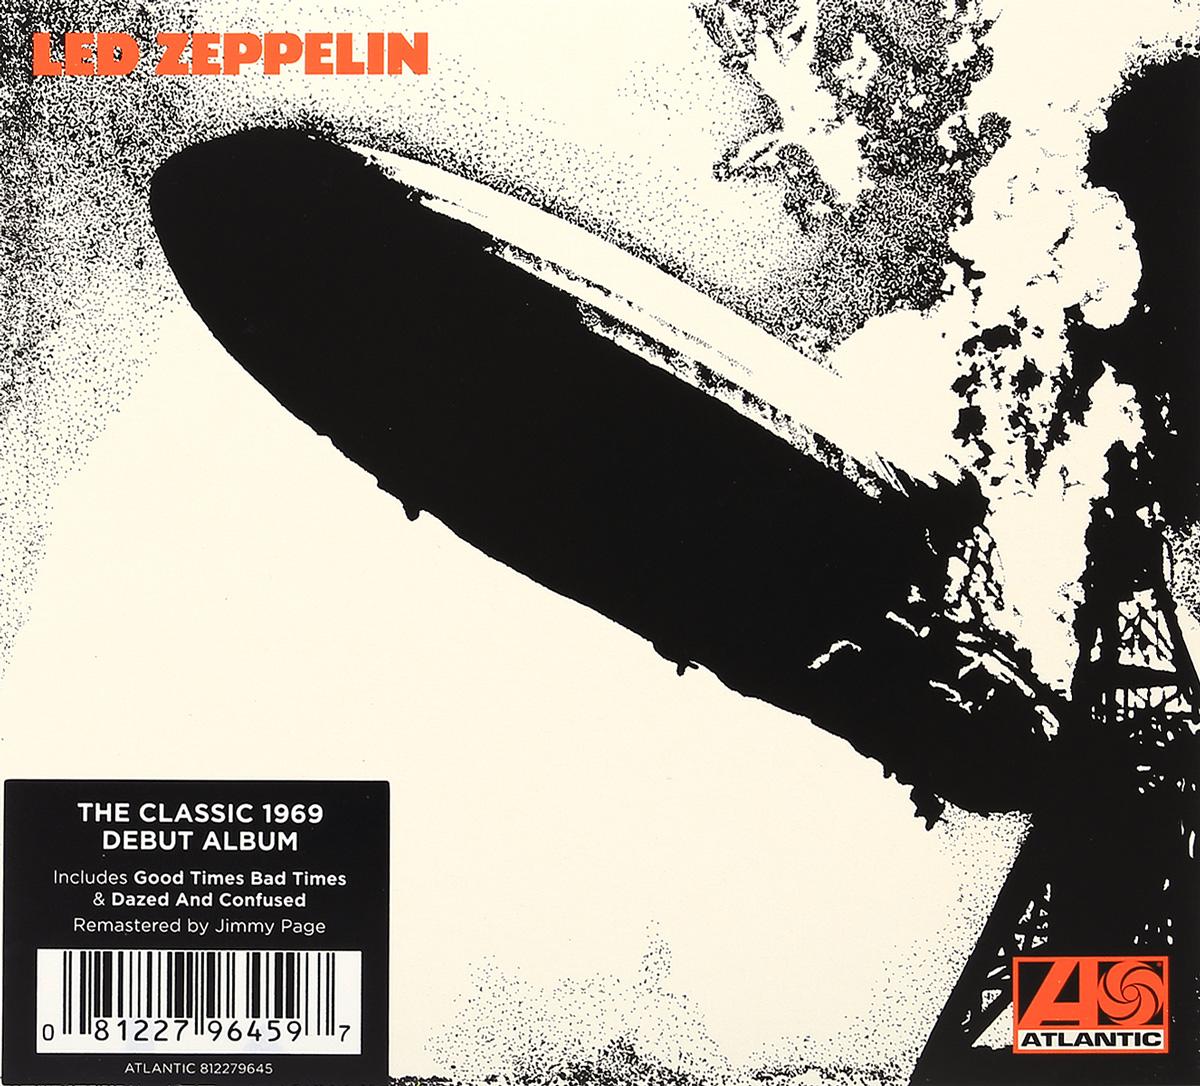 Led Zeppelin Led Zeppelin. Led Zeppelin led zeppelin led zeppelin led zeppelin iii 2 cd